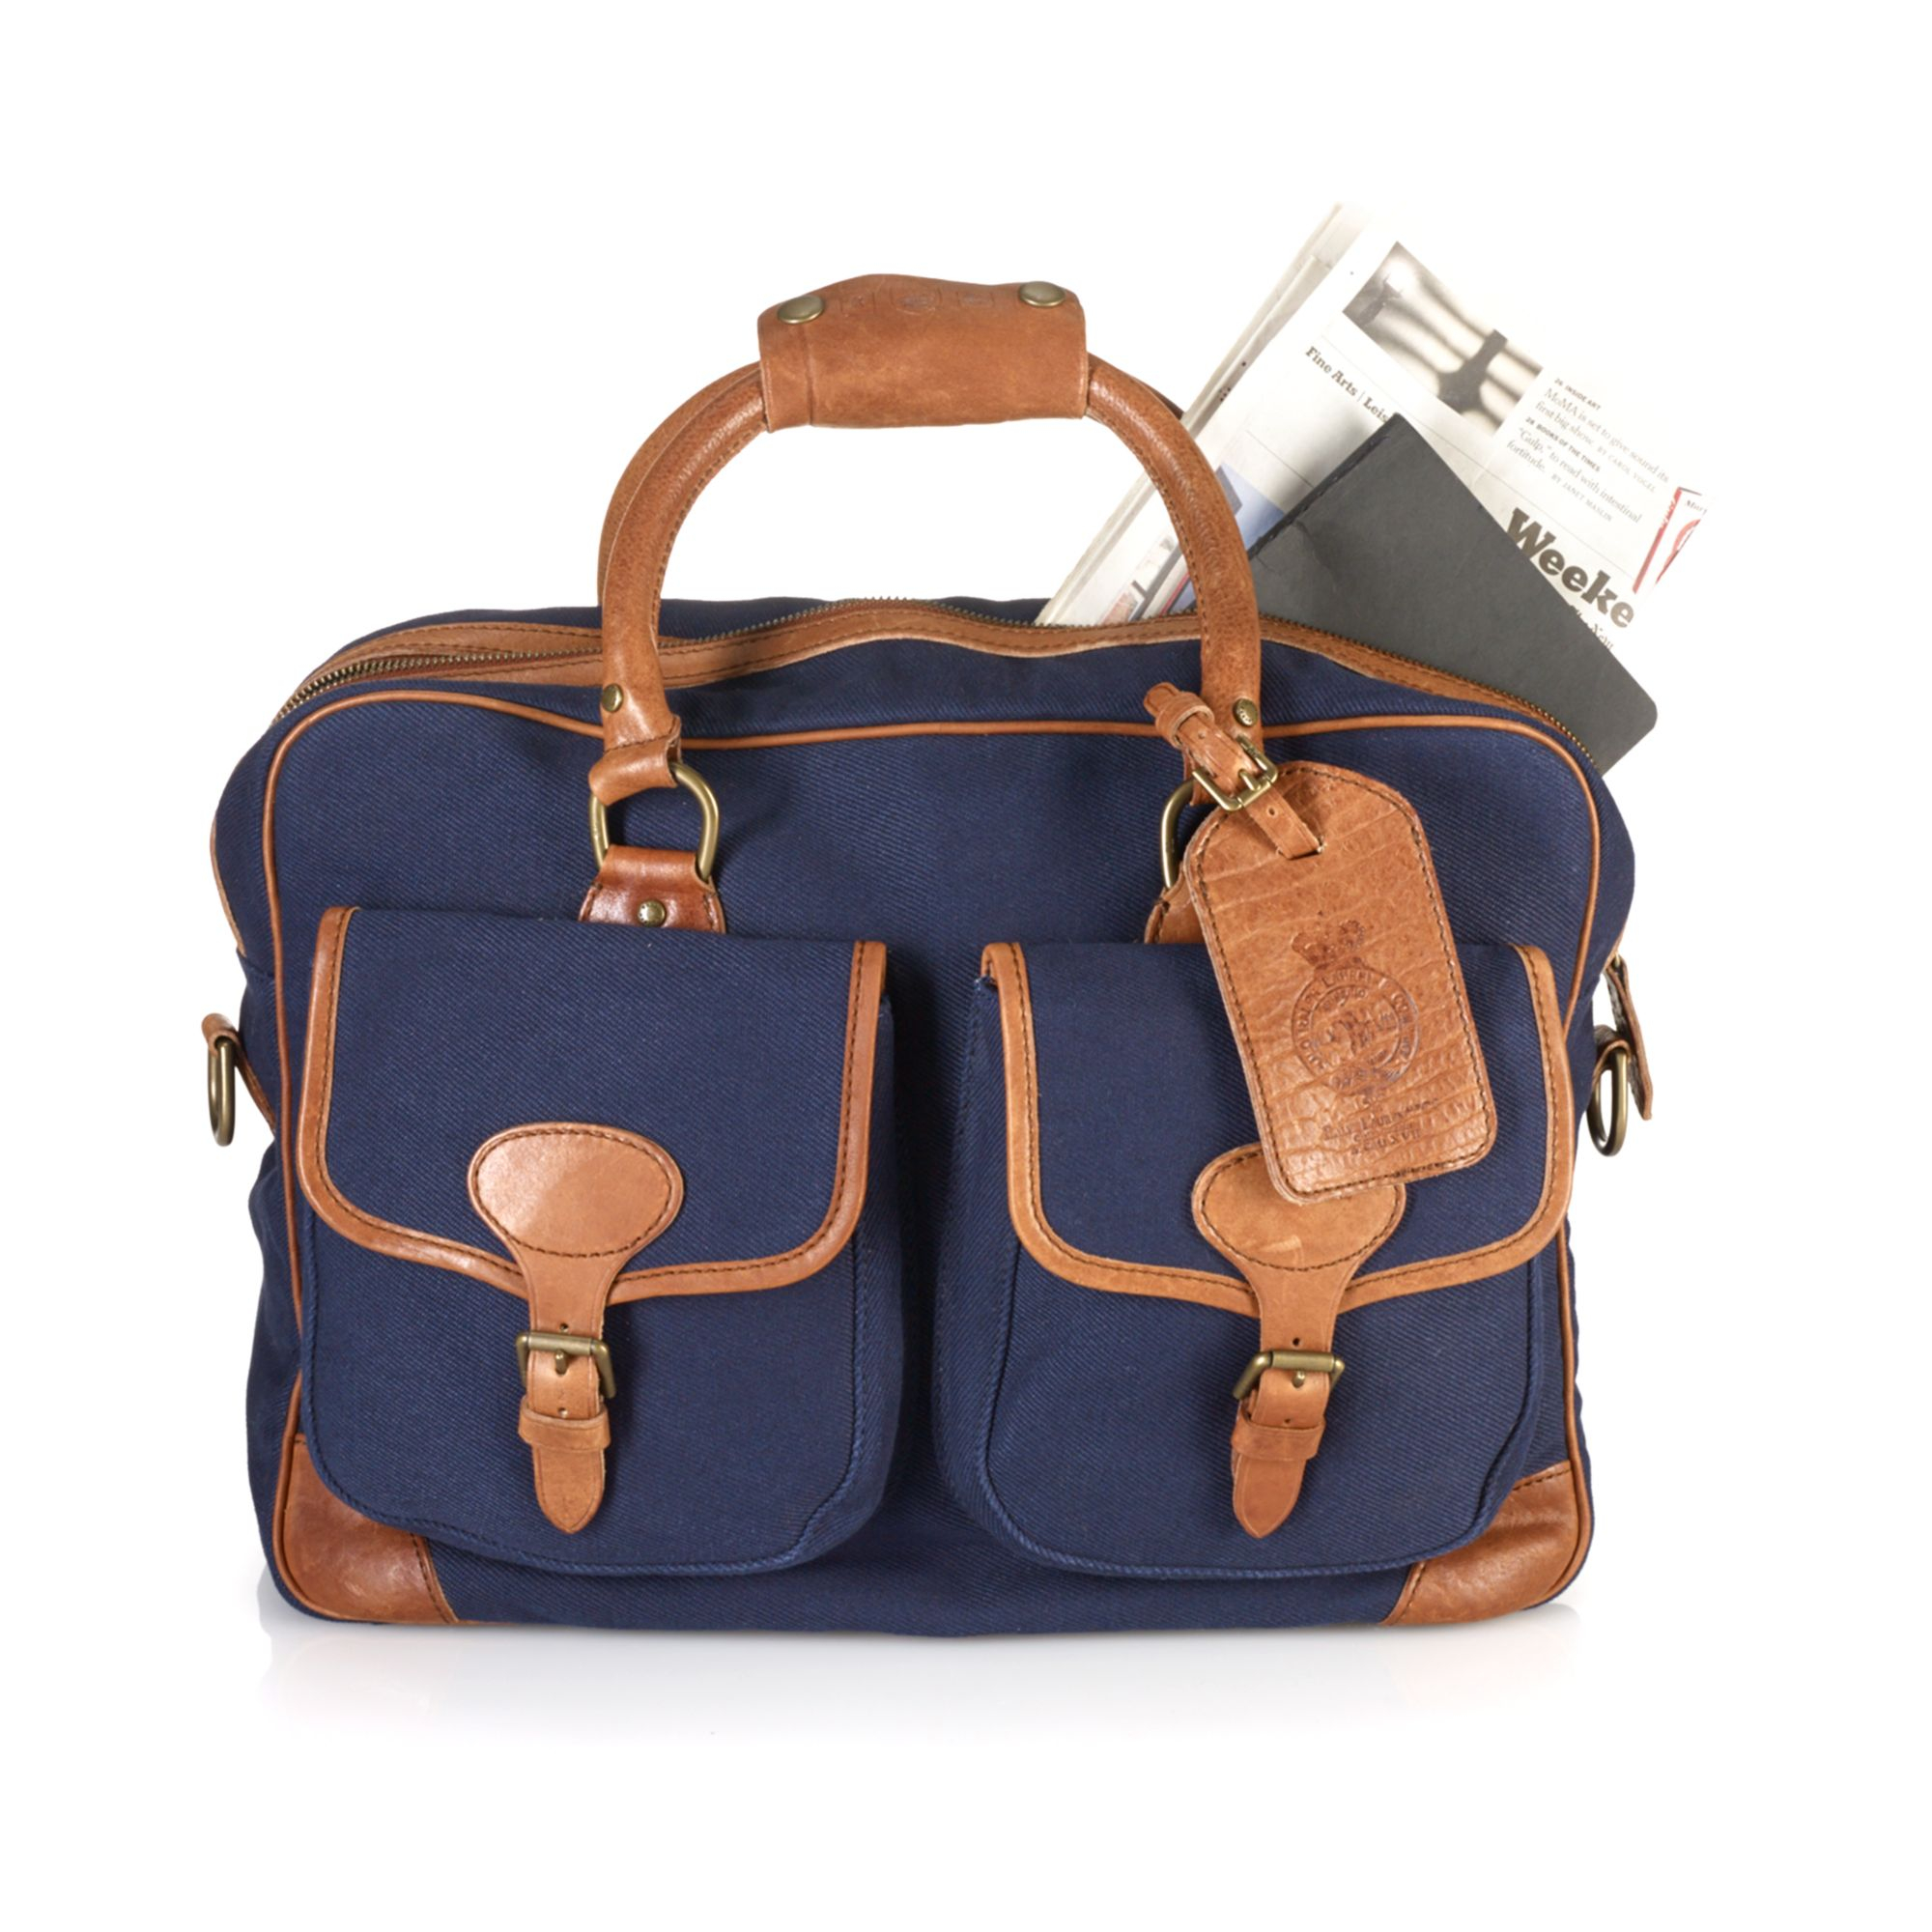 0637b24916 ... cheapest lyst ralph lauren polo mens canvas commuter bag in blue for  men 85875 1bbf8